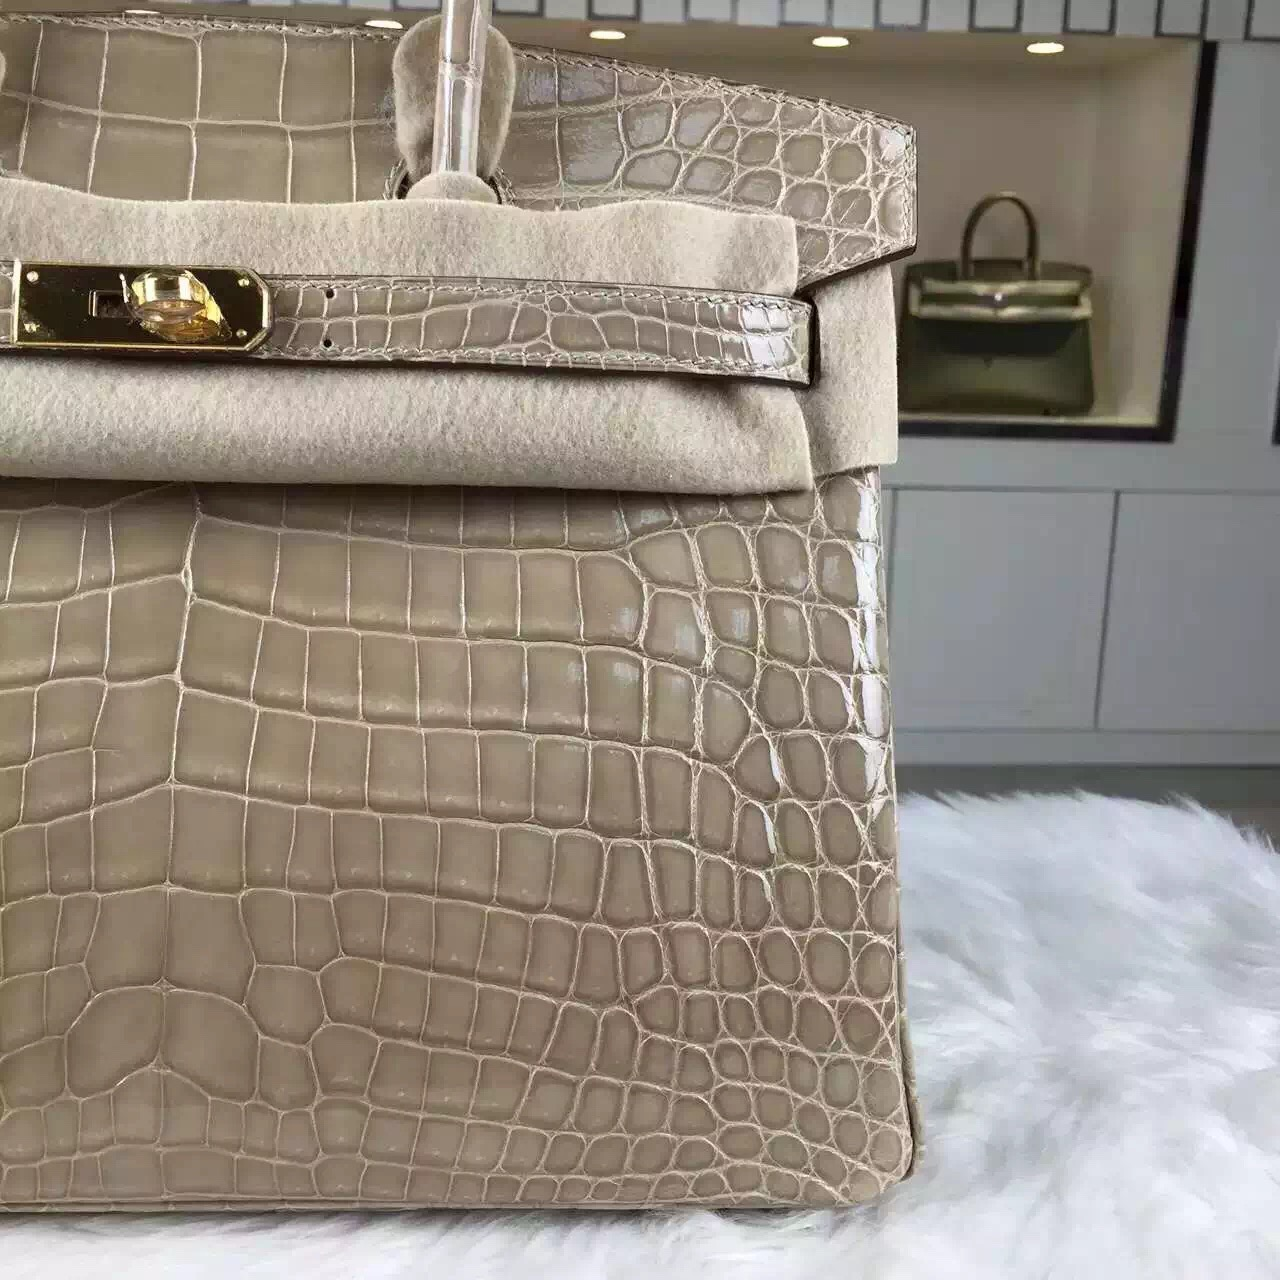 Hermes Custom-made Original Crocodile Shiny Leather Birkin Bag30cm in Apricot